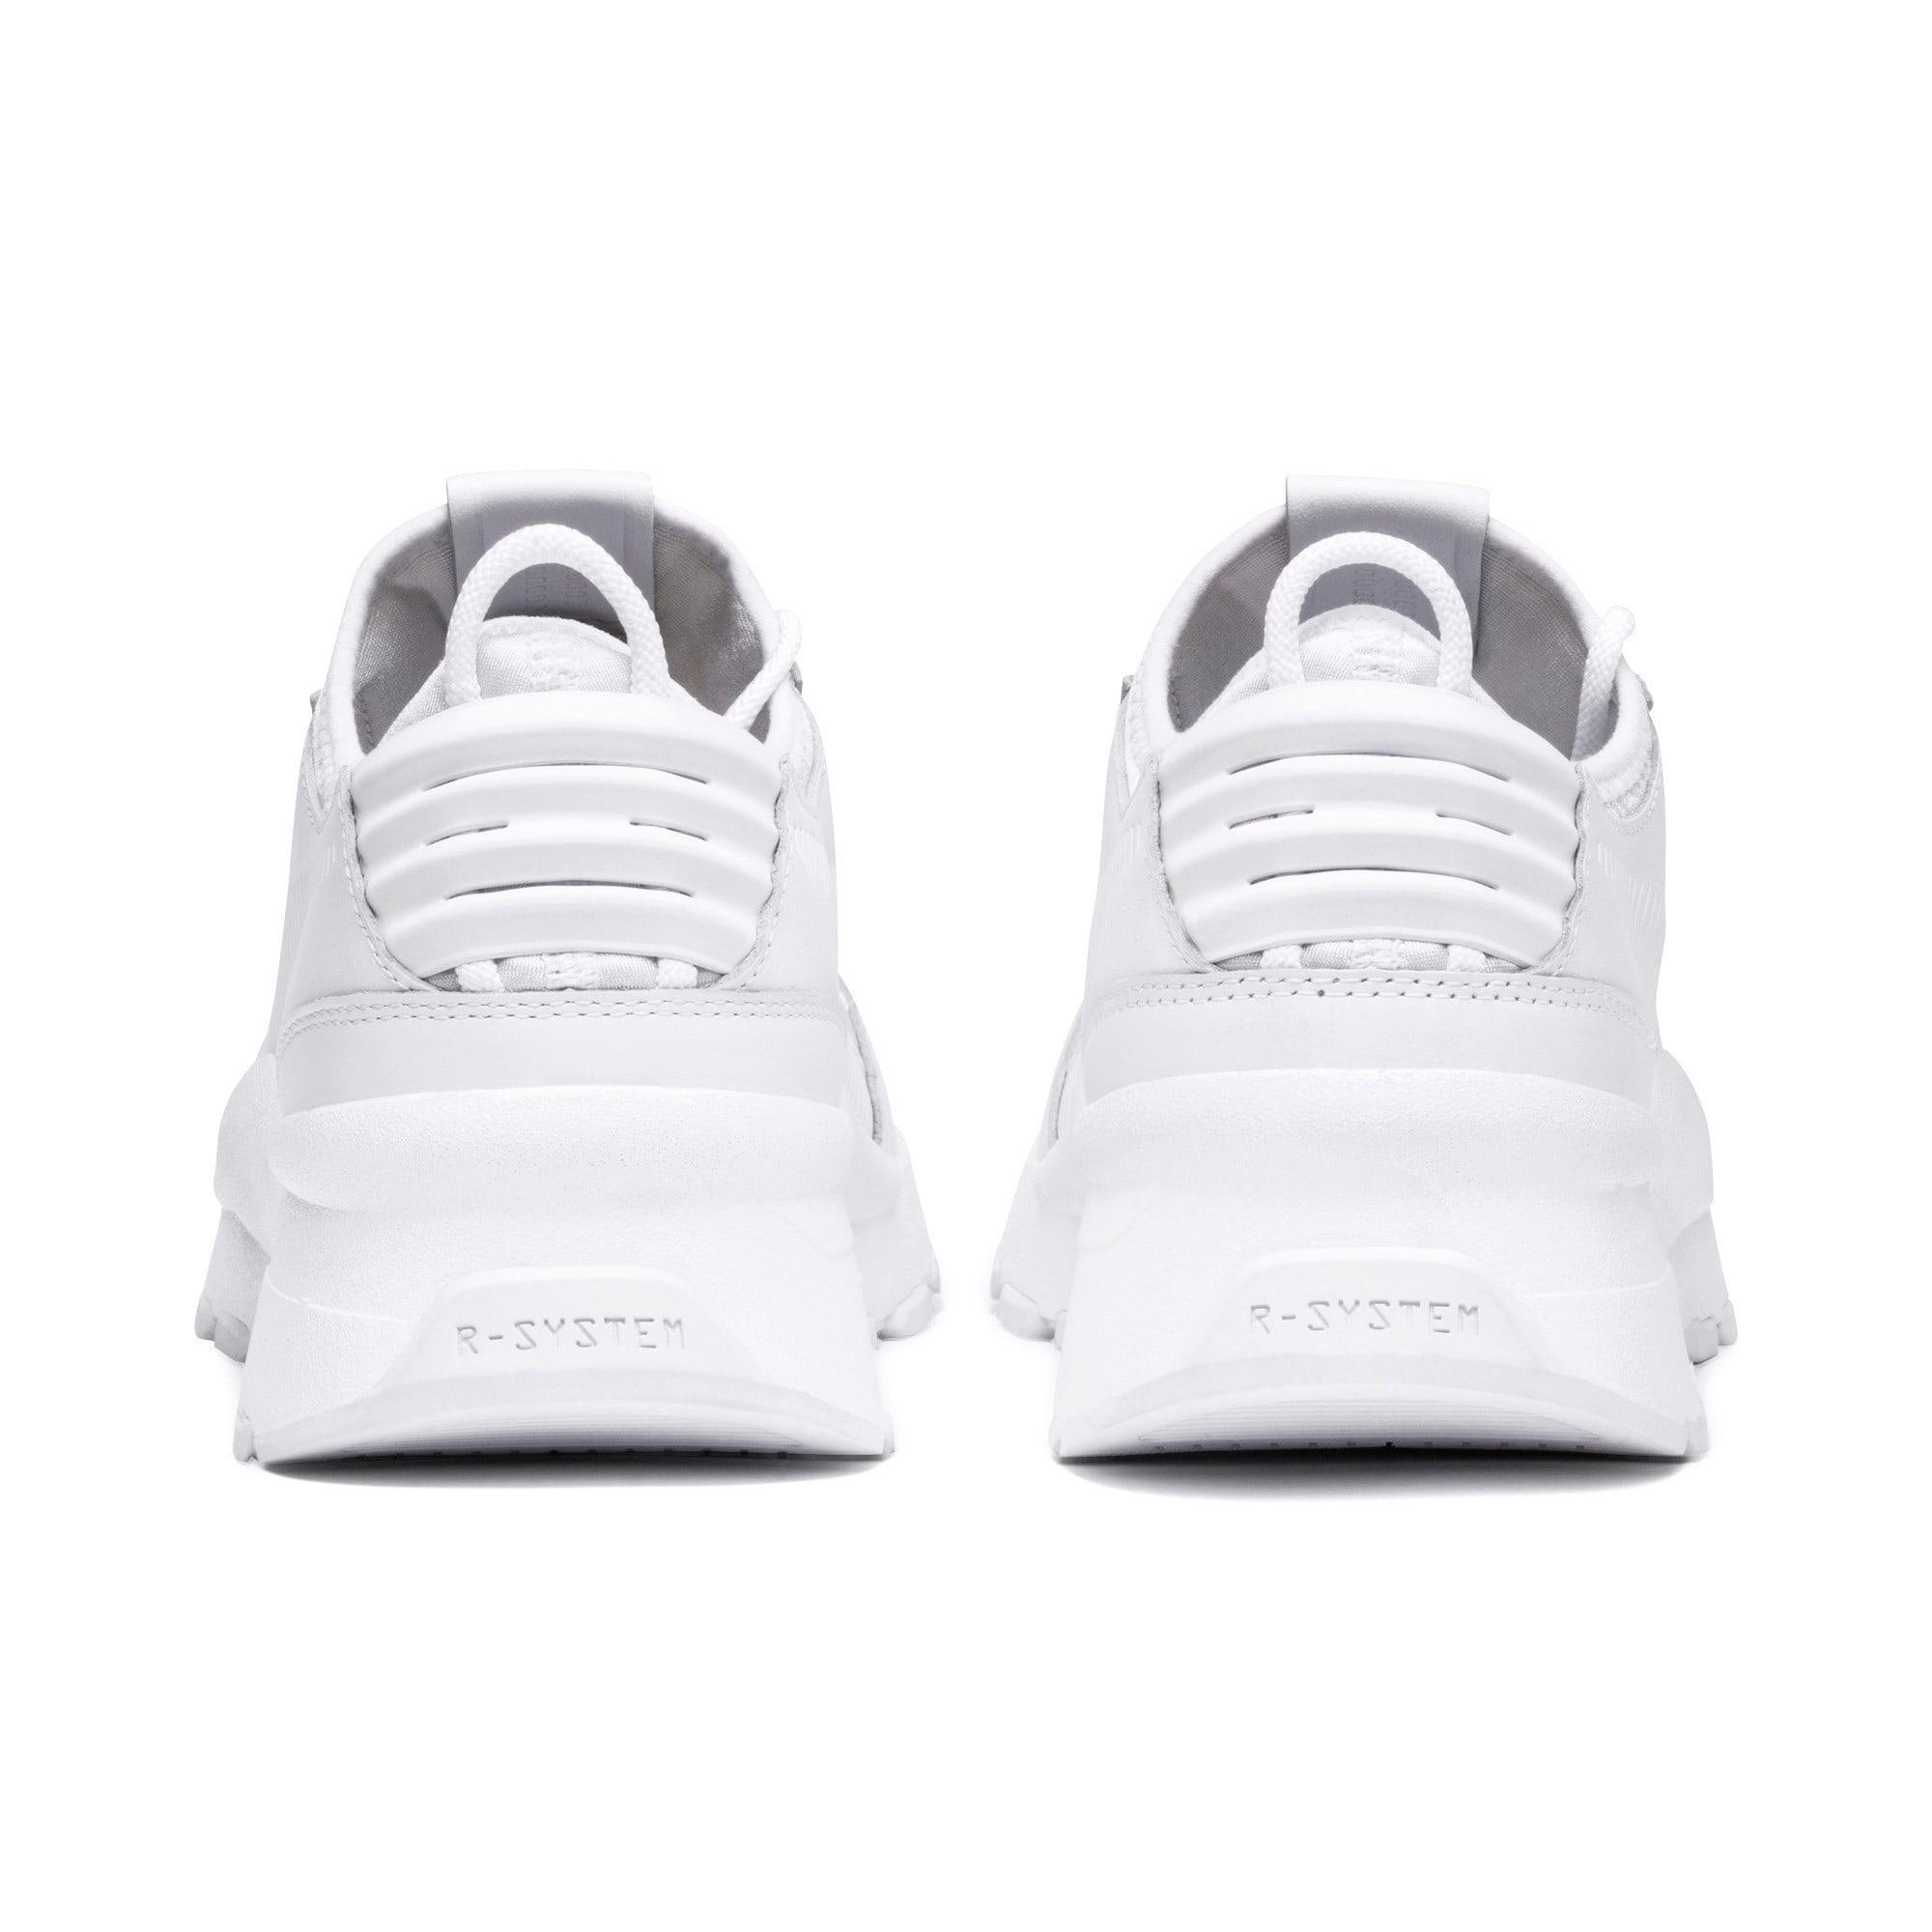 Thumbnail 3 of Evolution RS-0 SOUND sneakers, Puma White, medium